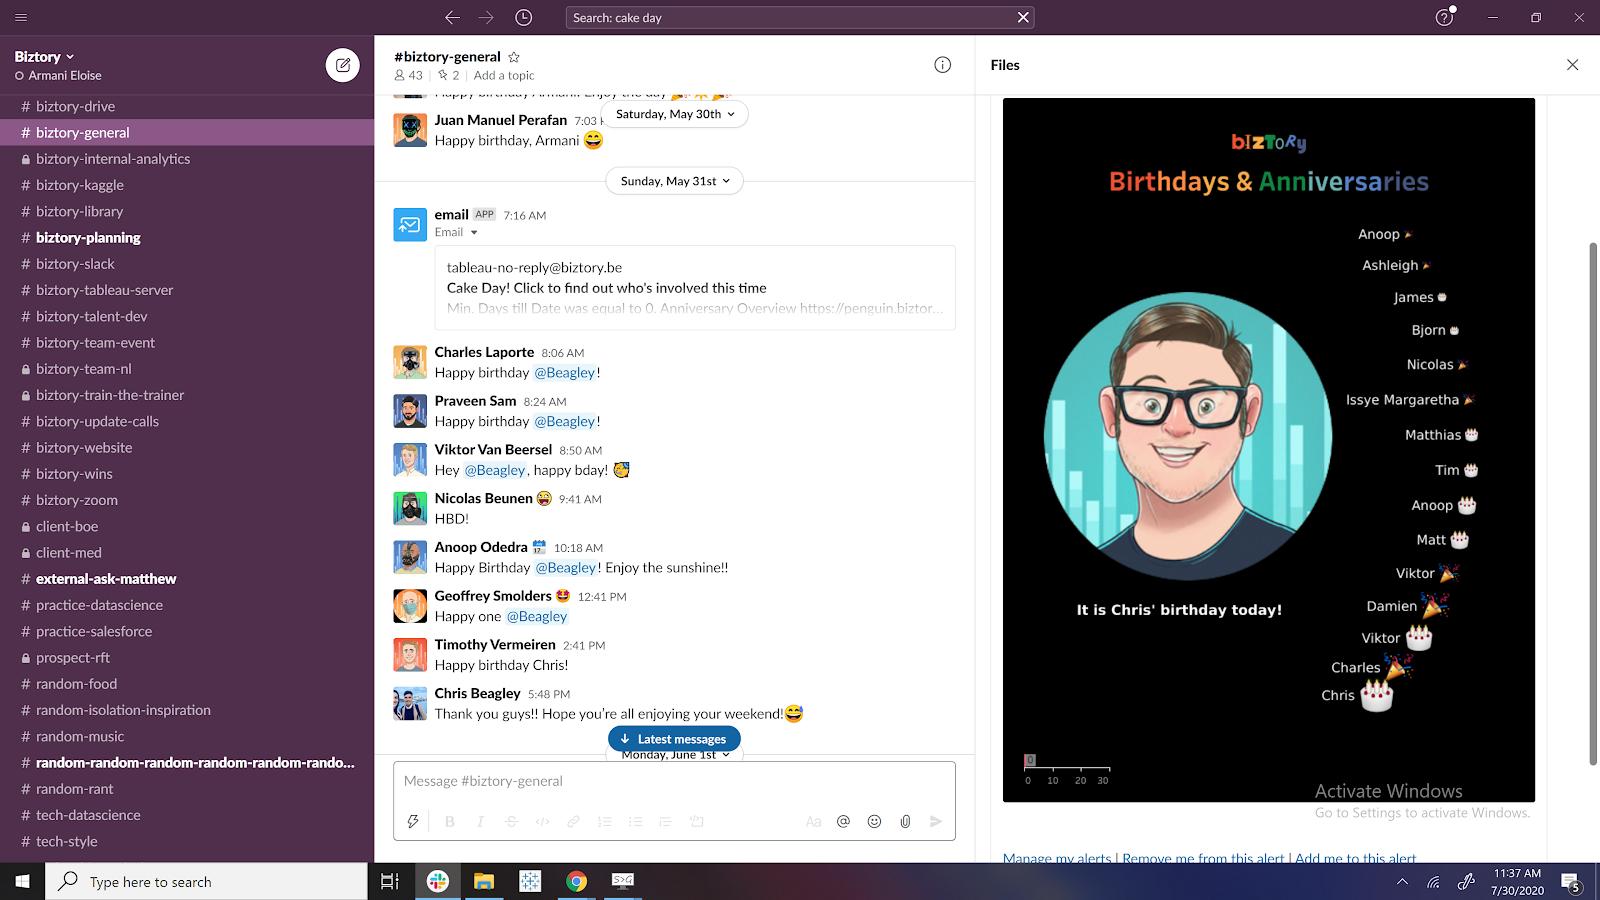 Biztory Anniversary overview in Slack